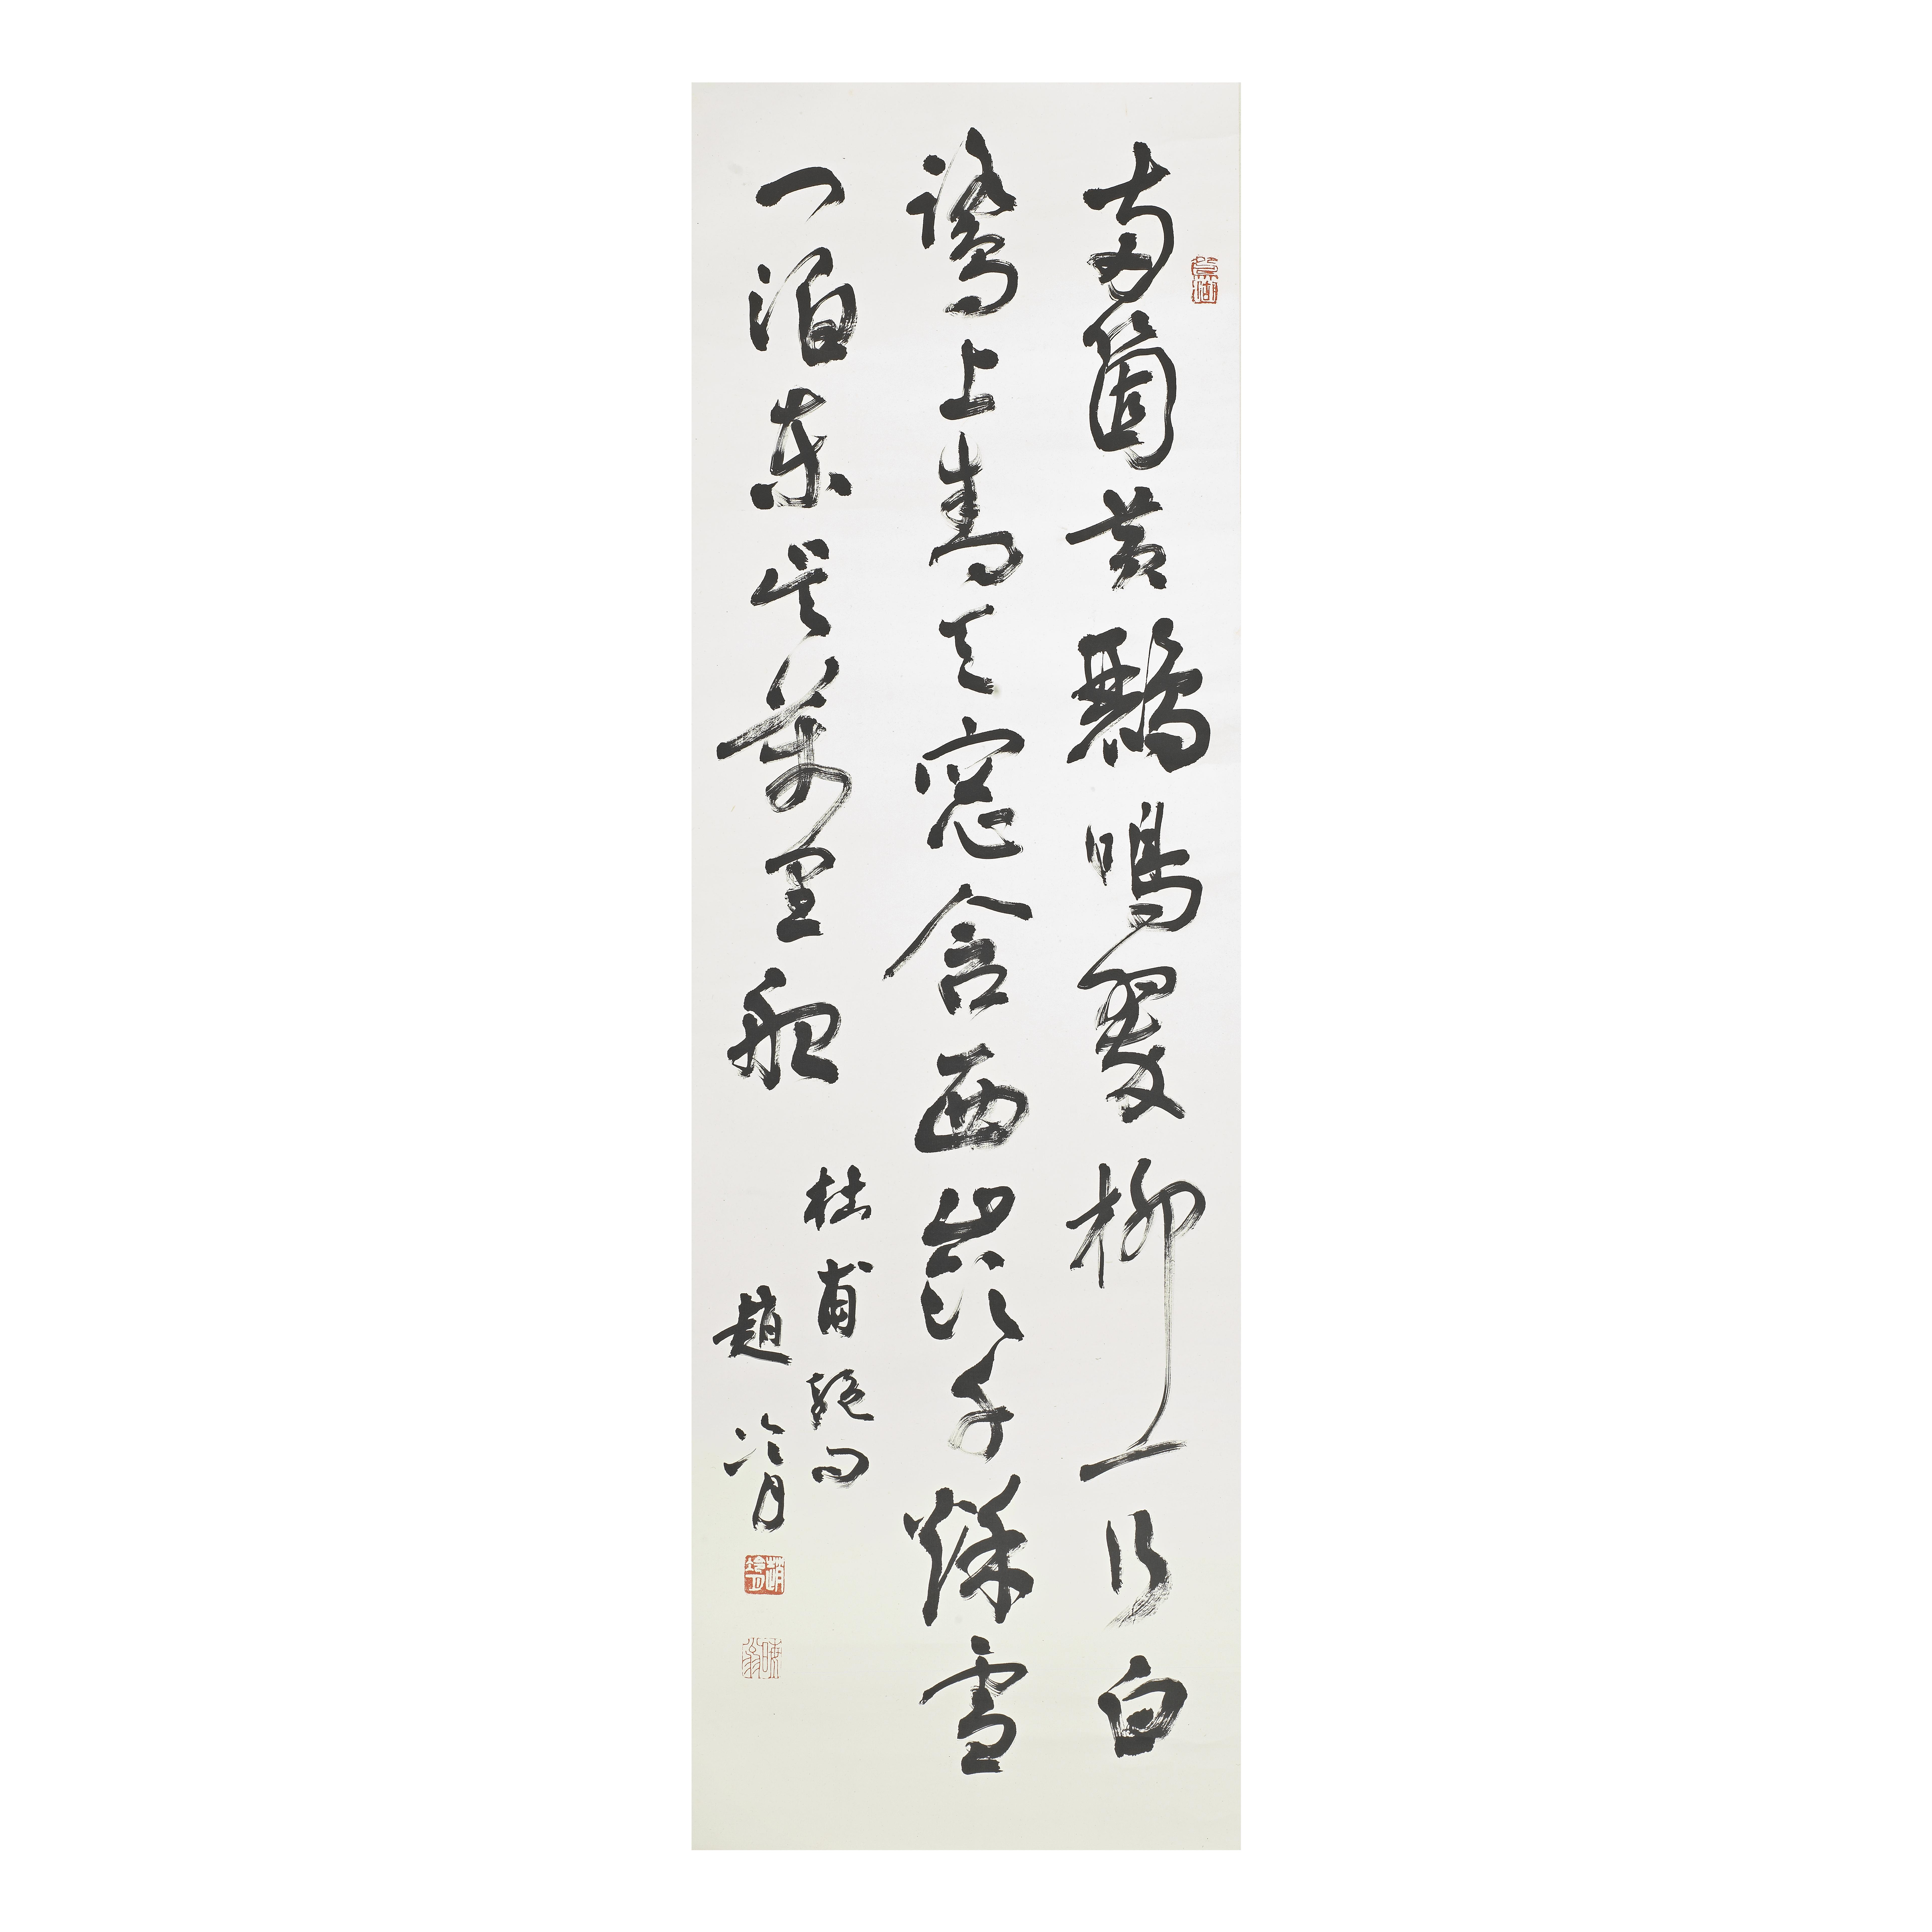 ZHAO LENGYUE (1915-2002) 'Calligraphy in running script'